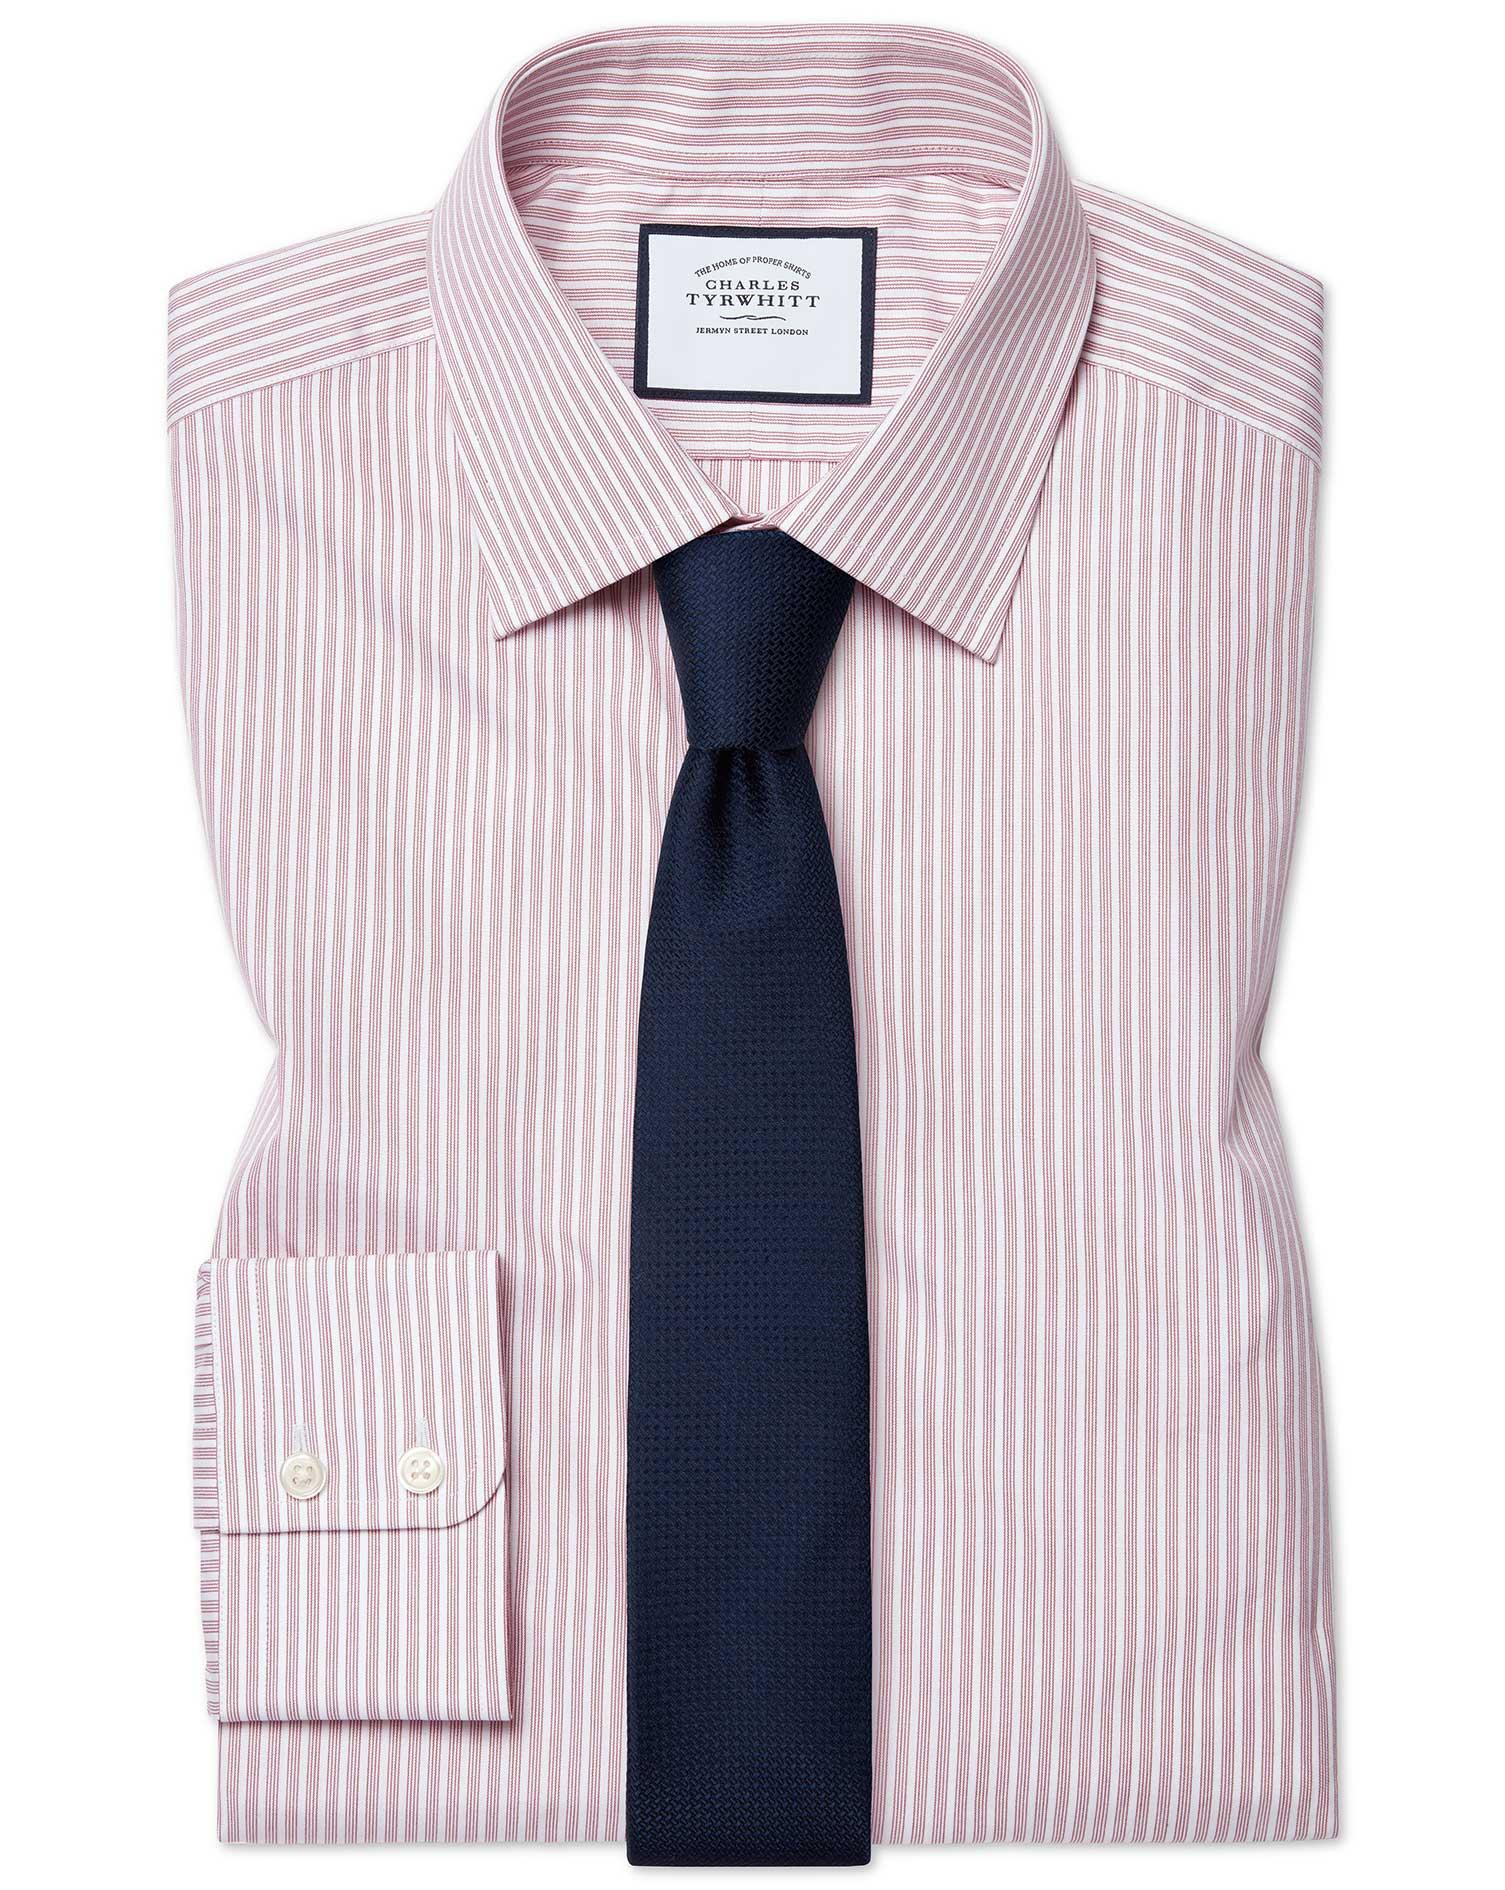 Cotton Extra Slim Fit Poplin Fine Stripe Pink Shirt